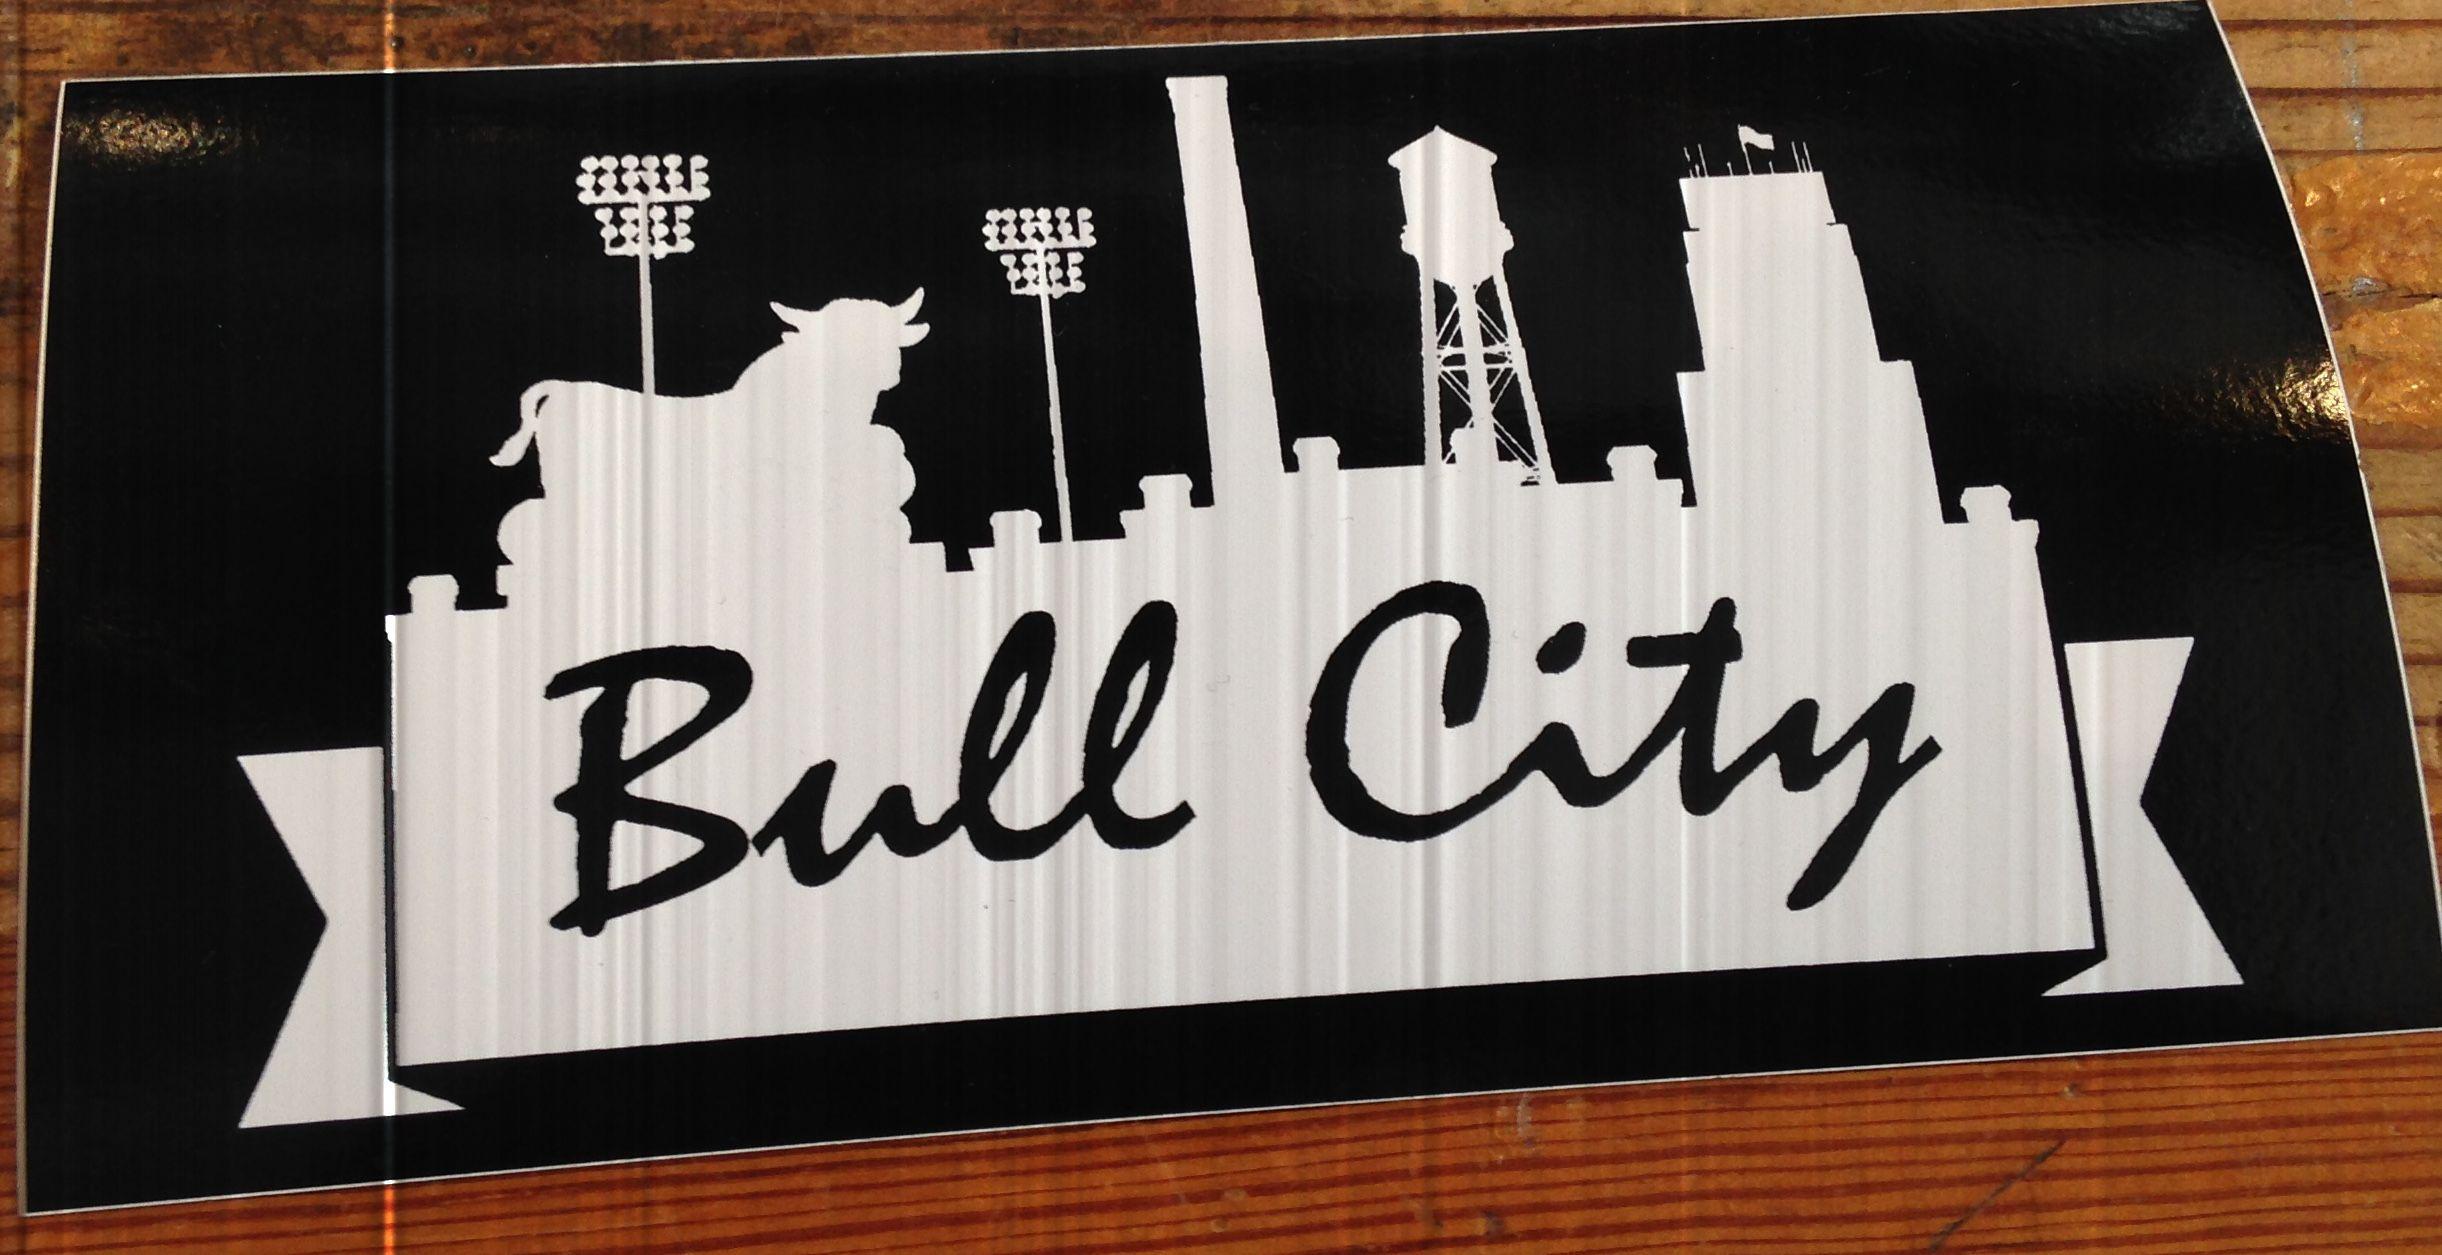 Bumper sticker design ideas - Bull City Skyline Bumper Sticker